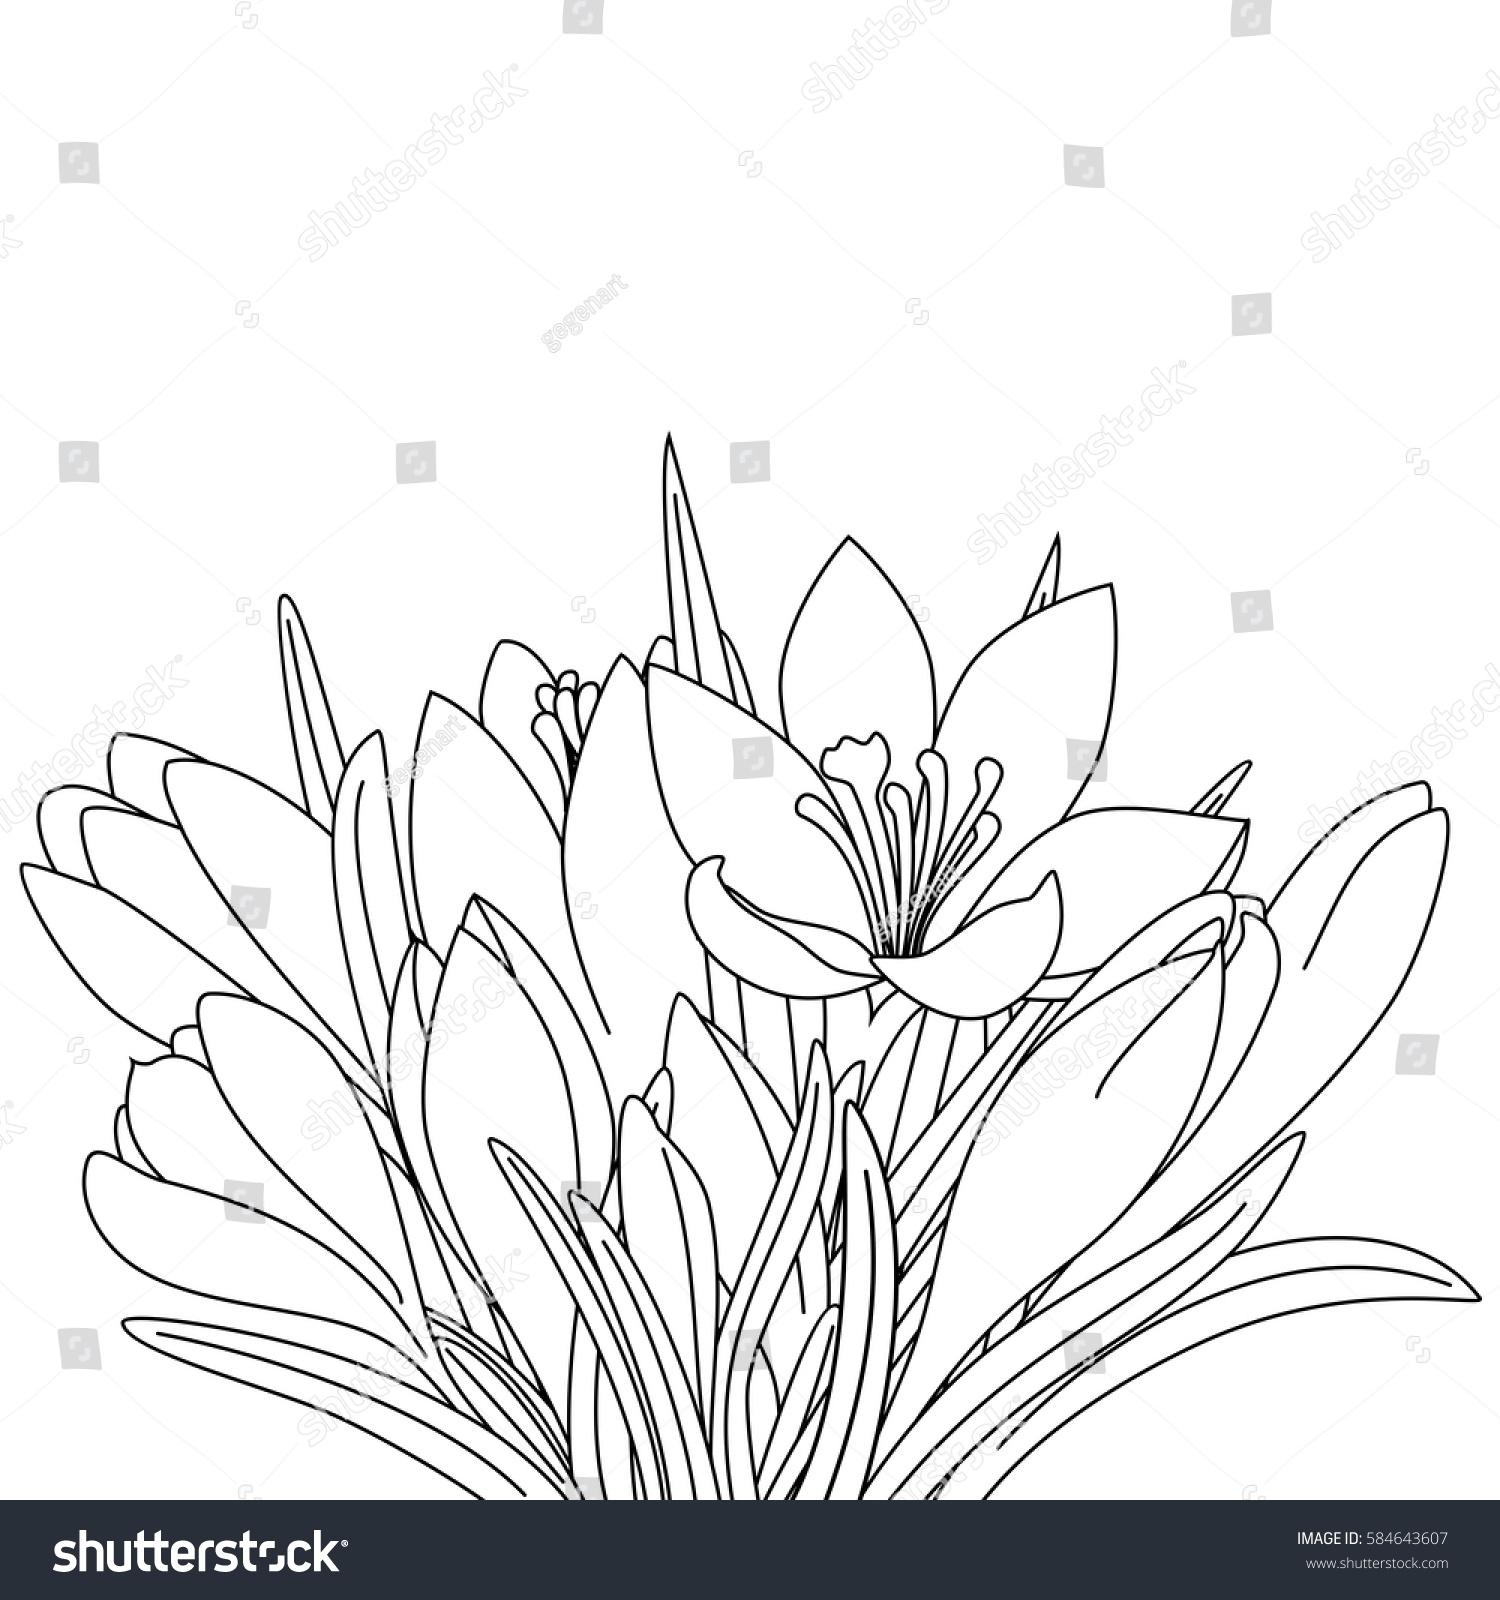 Spring flowers outline drawing crocuses coloring stock illustration spring flowers outline drawing of crocuses for coloring coloring page mightylinksfo